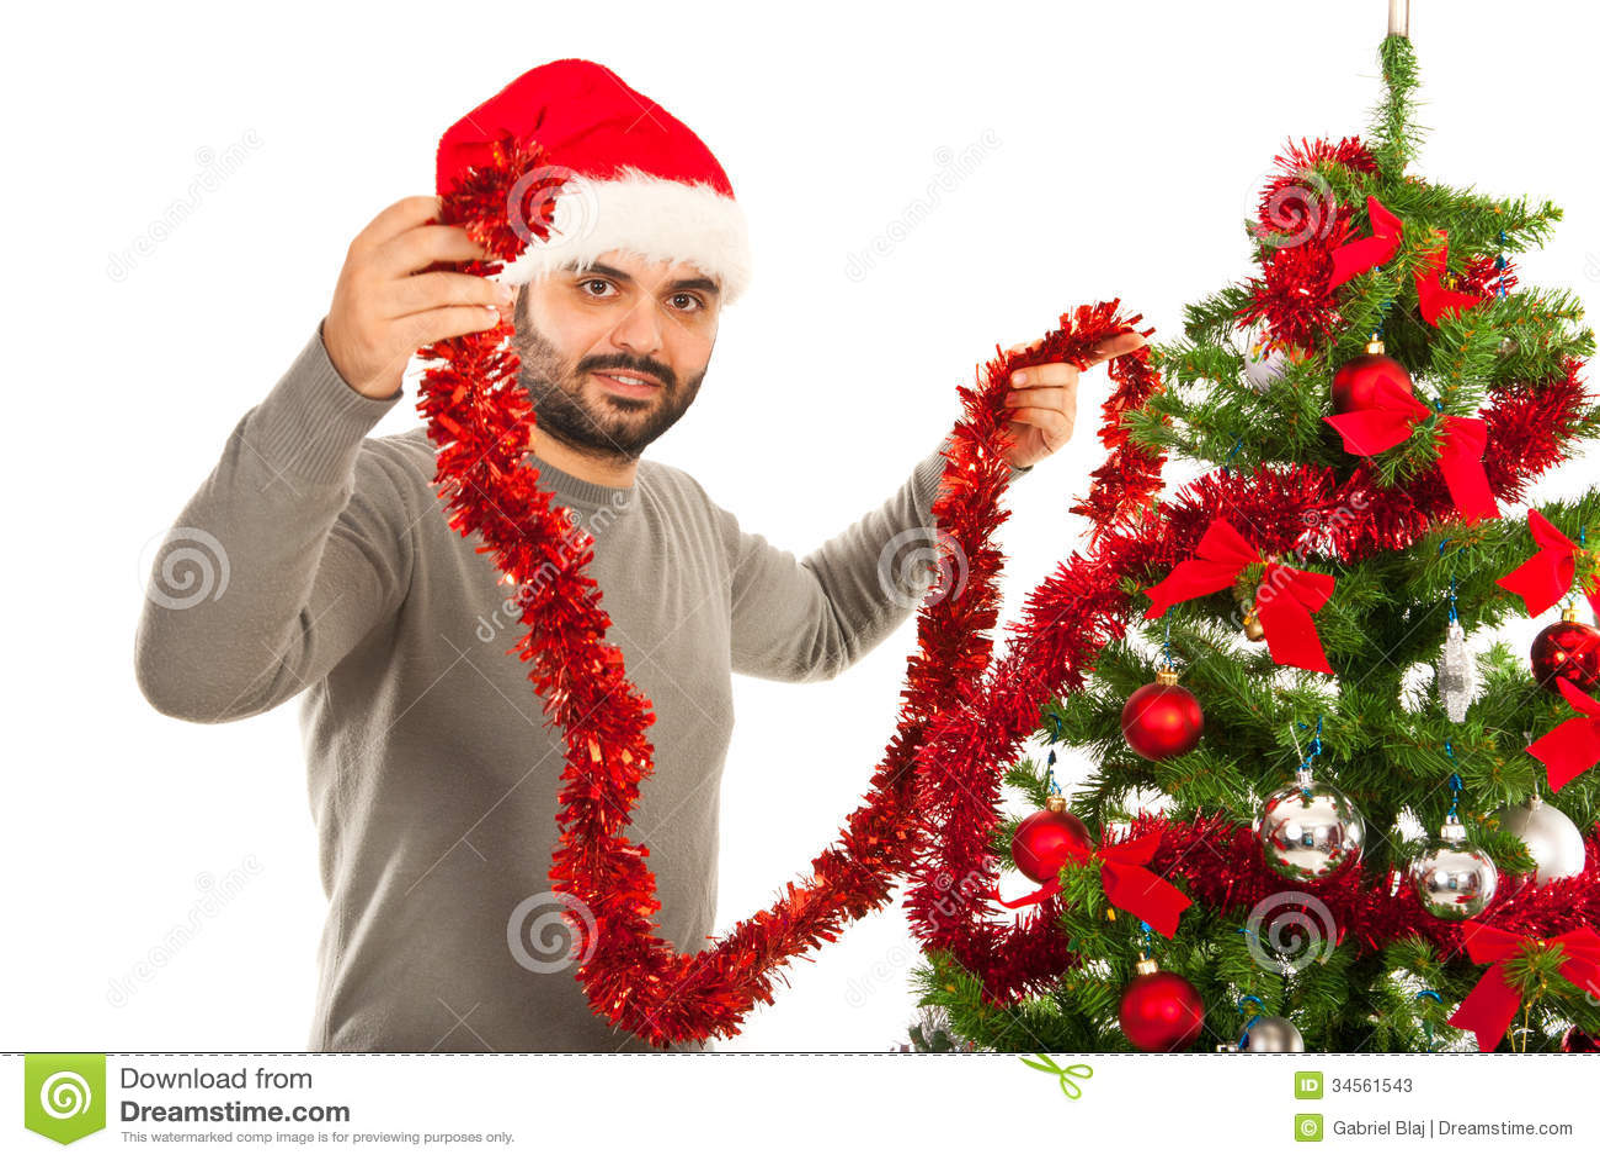 happy man decorate christmas tree royalty free stock photo - image